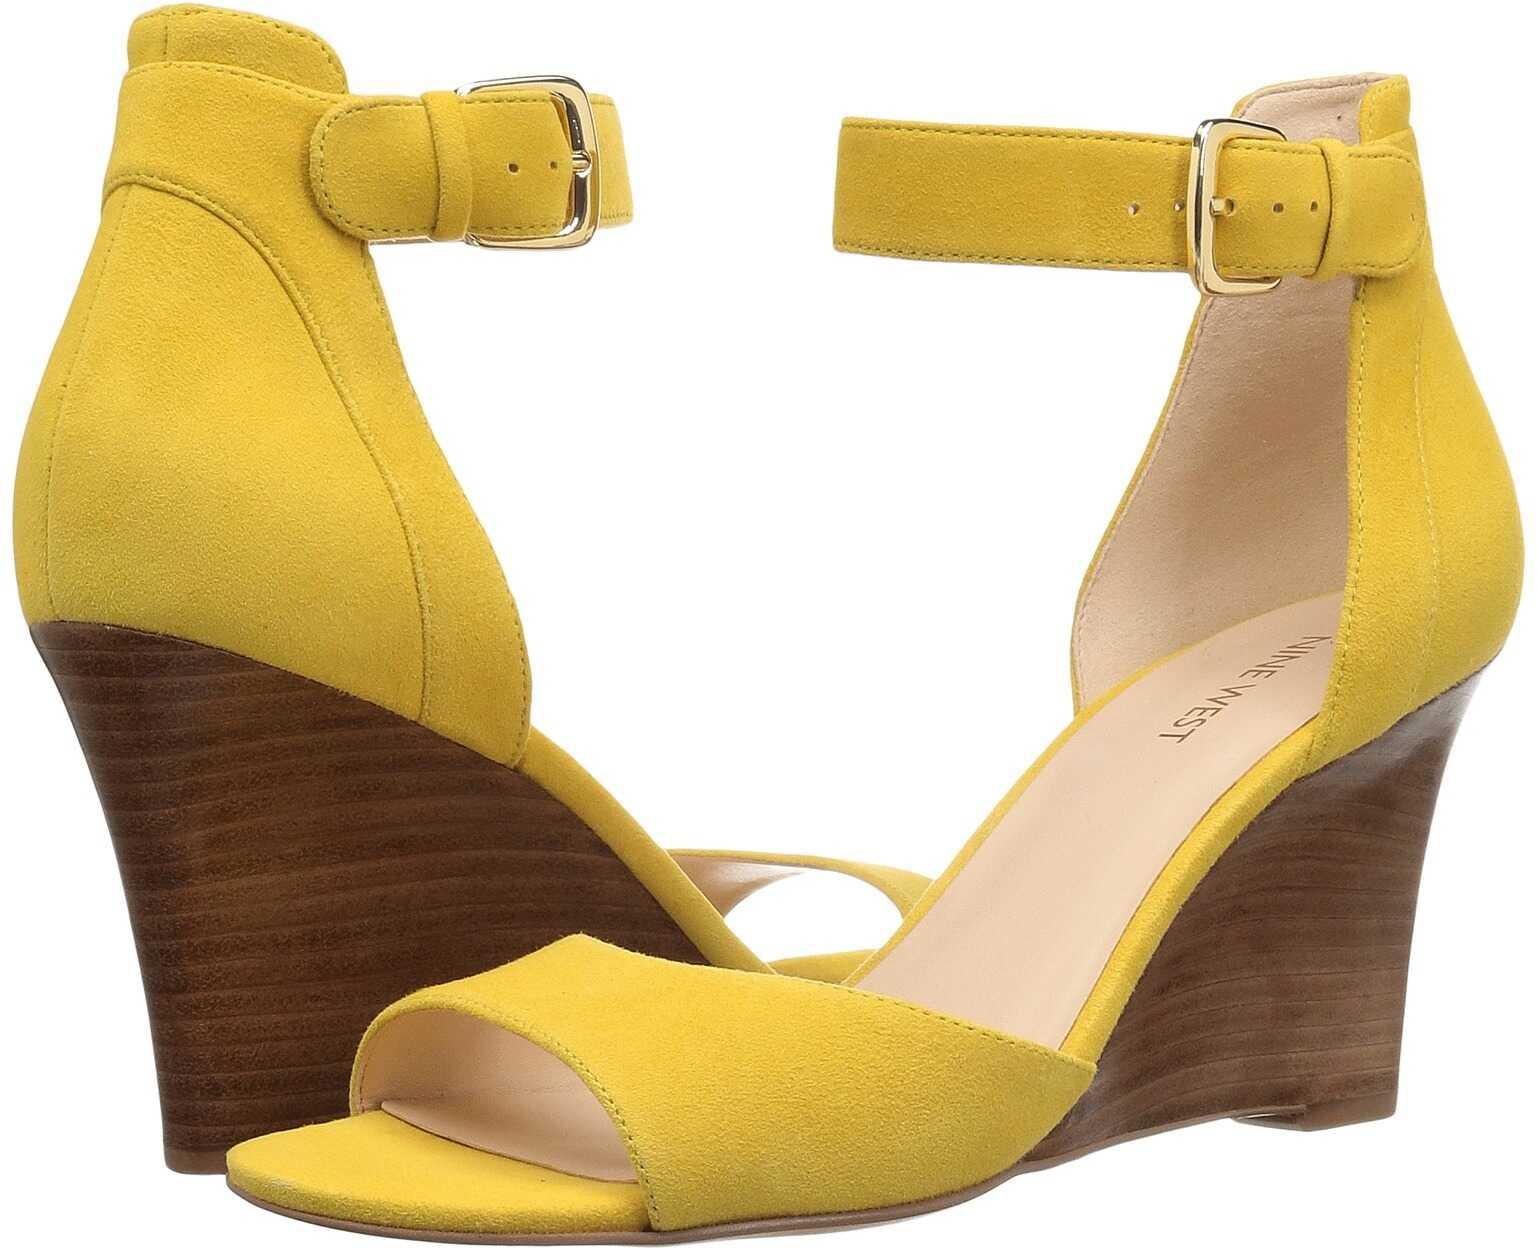 Nine West Farlee Yellow Leather